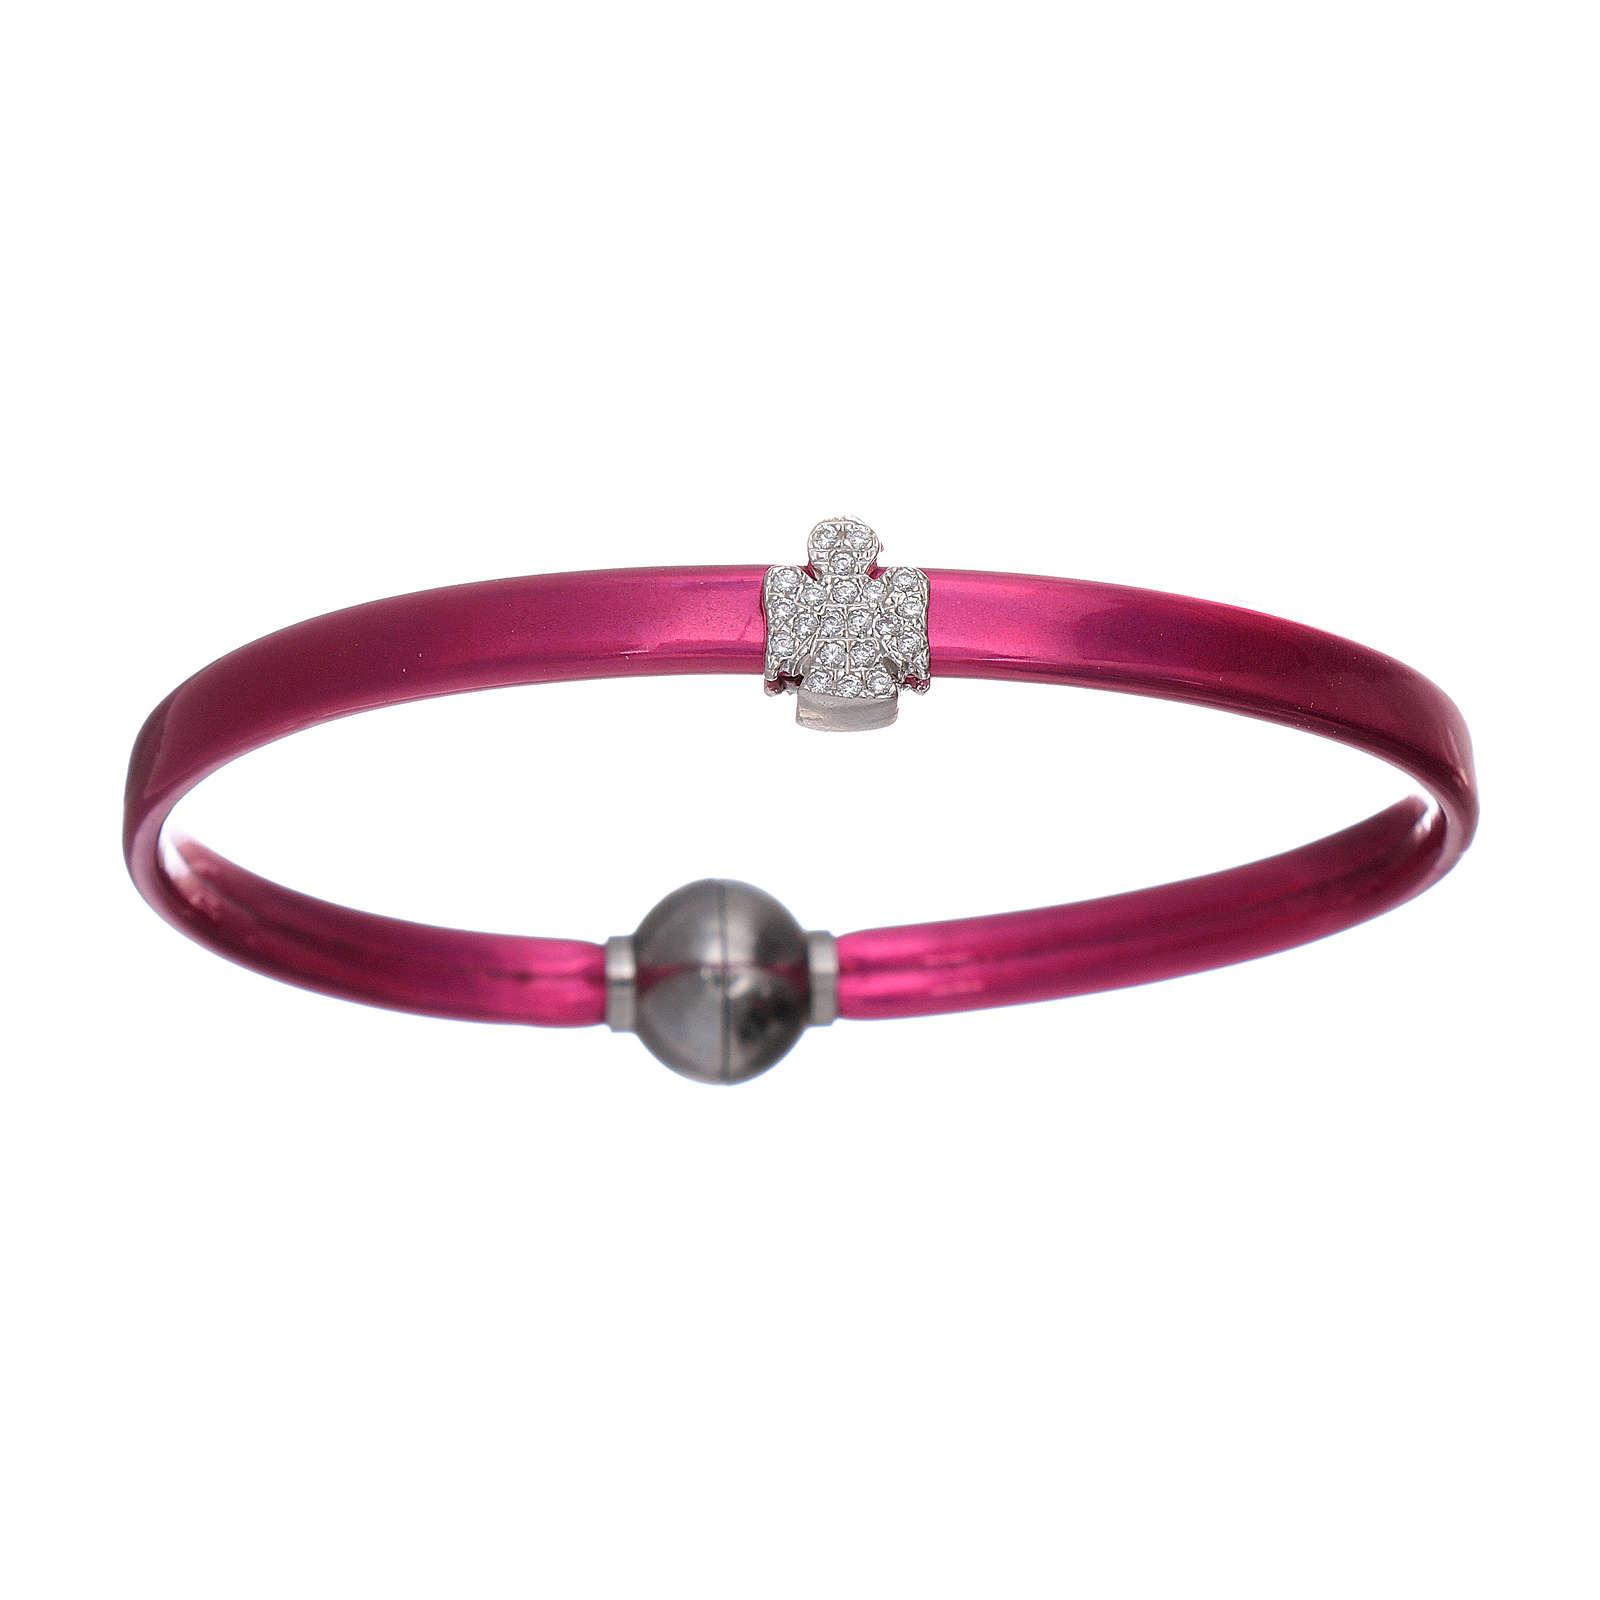 Bracelet ange zircons argent 925 AMEN thermoplastique fuchsia 4